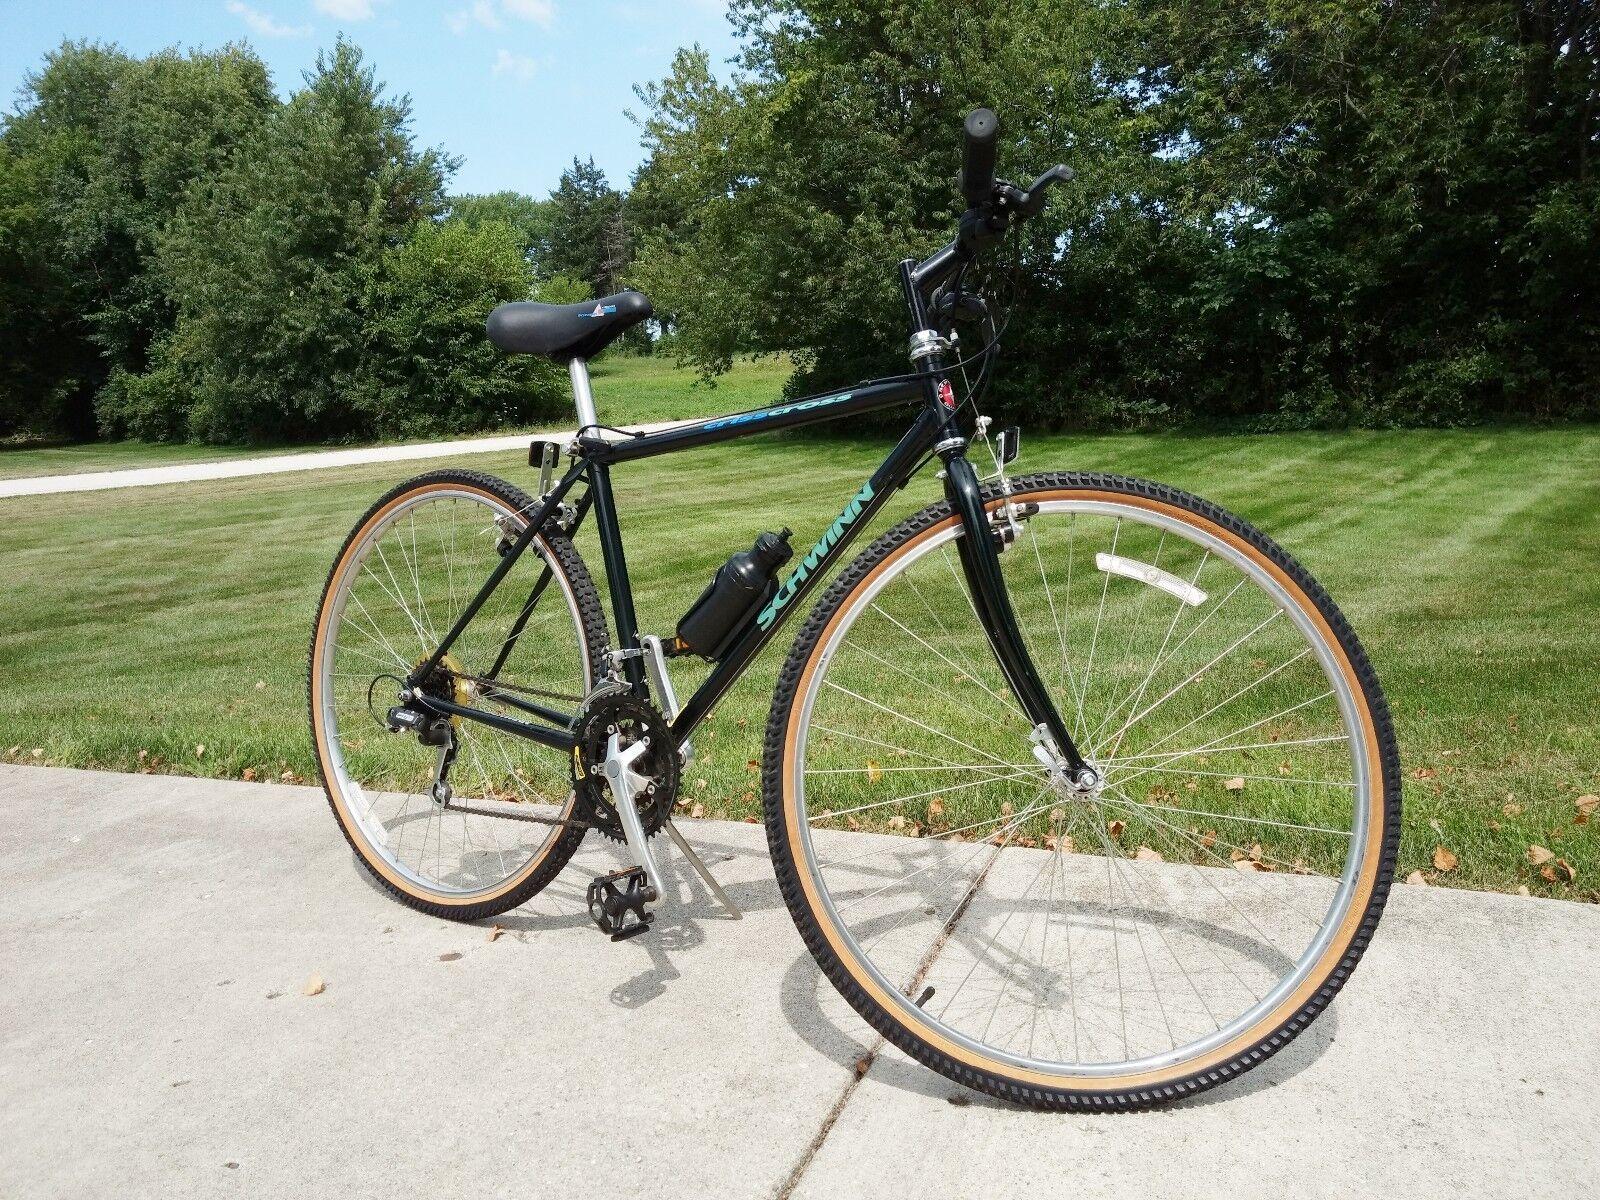 VTG SCHWINN MENS BICYCLE CRISSCROSS